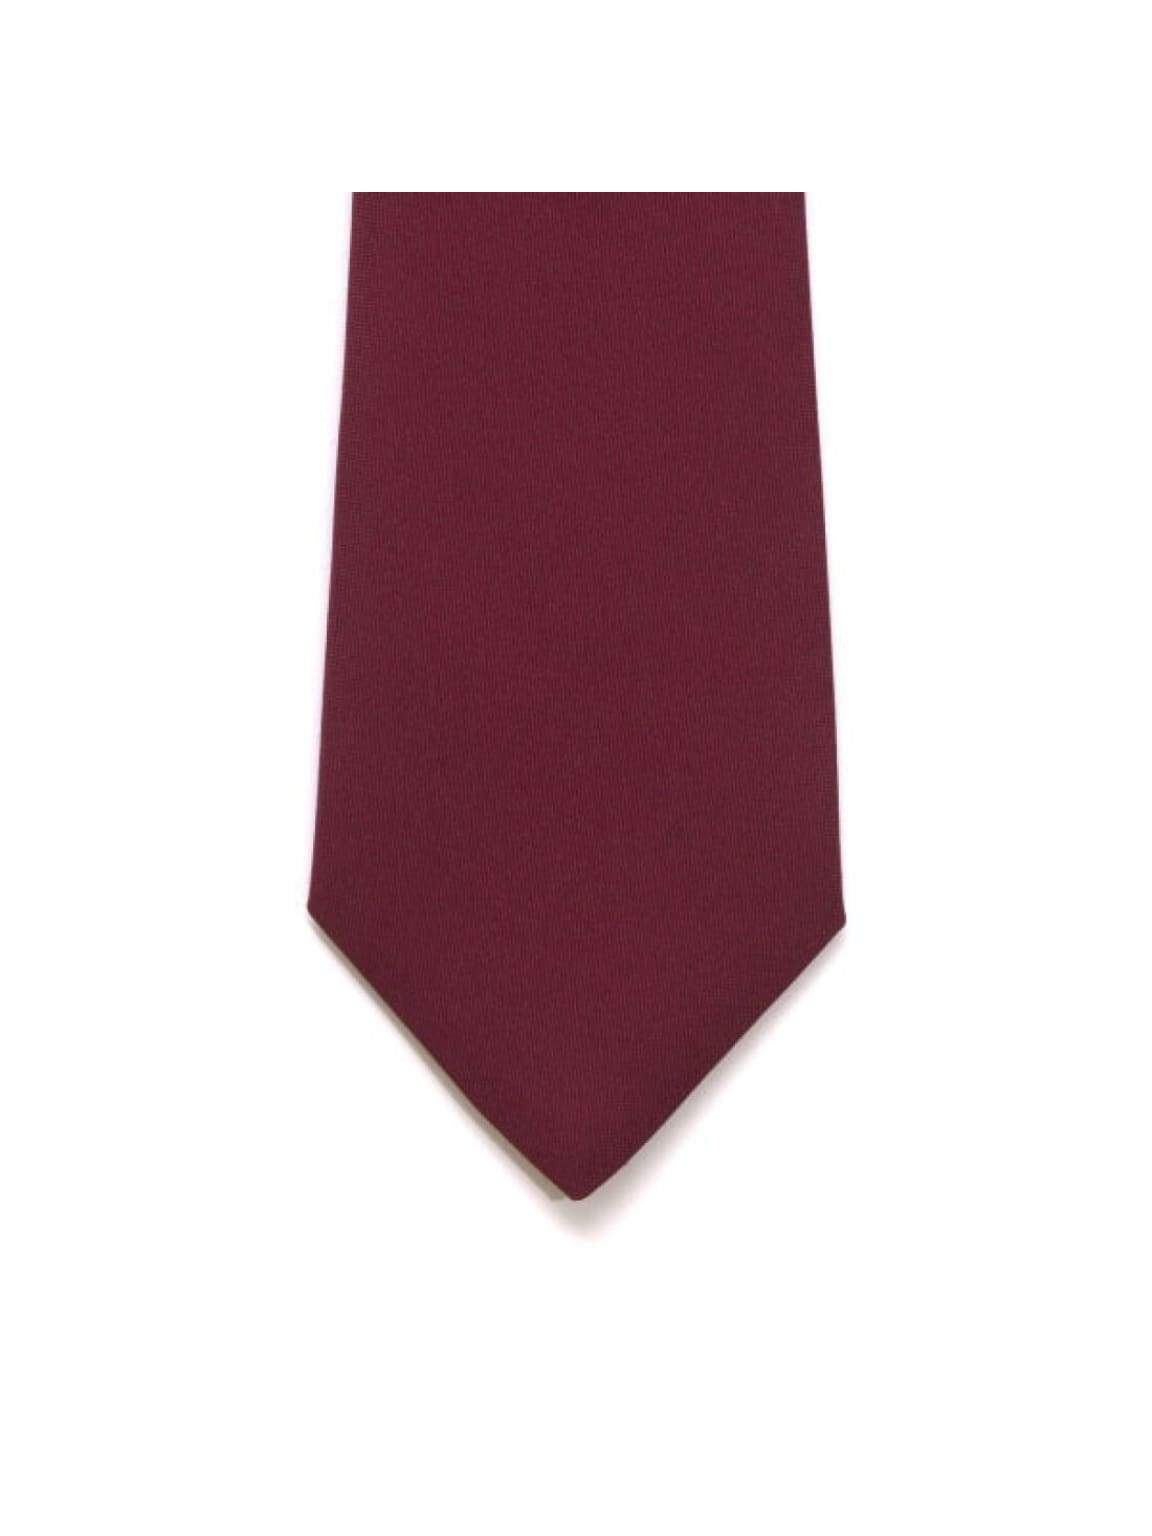 LA Smith Wine Skinny Panama Tie - Accessories